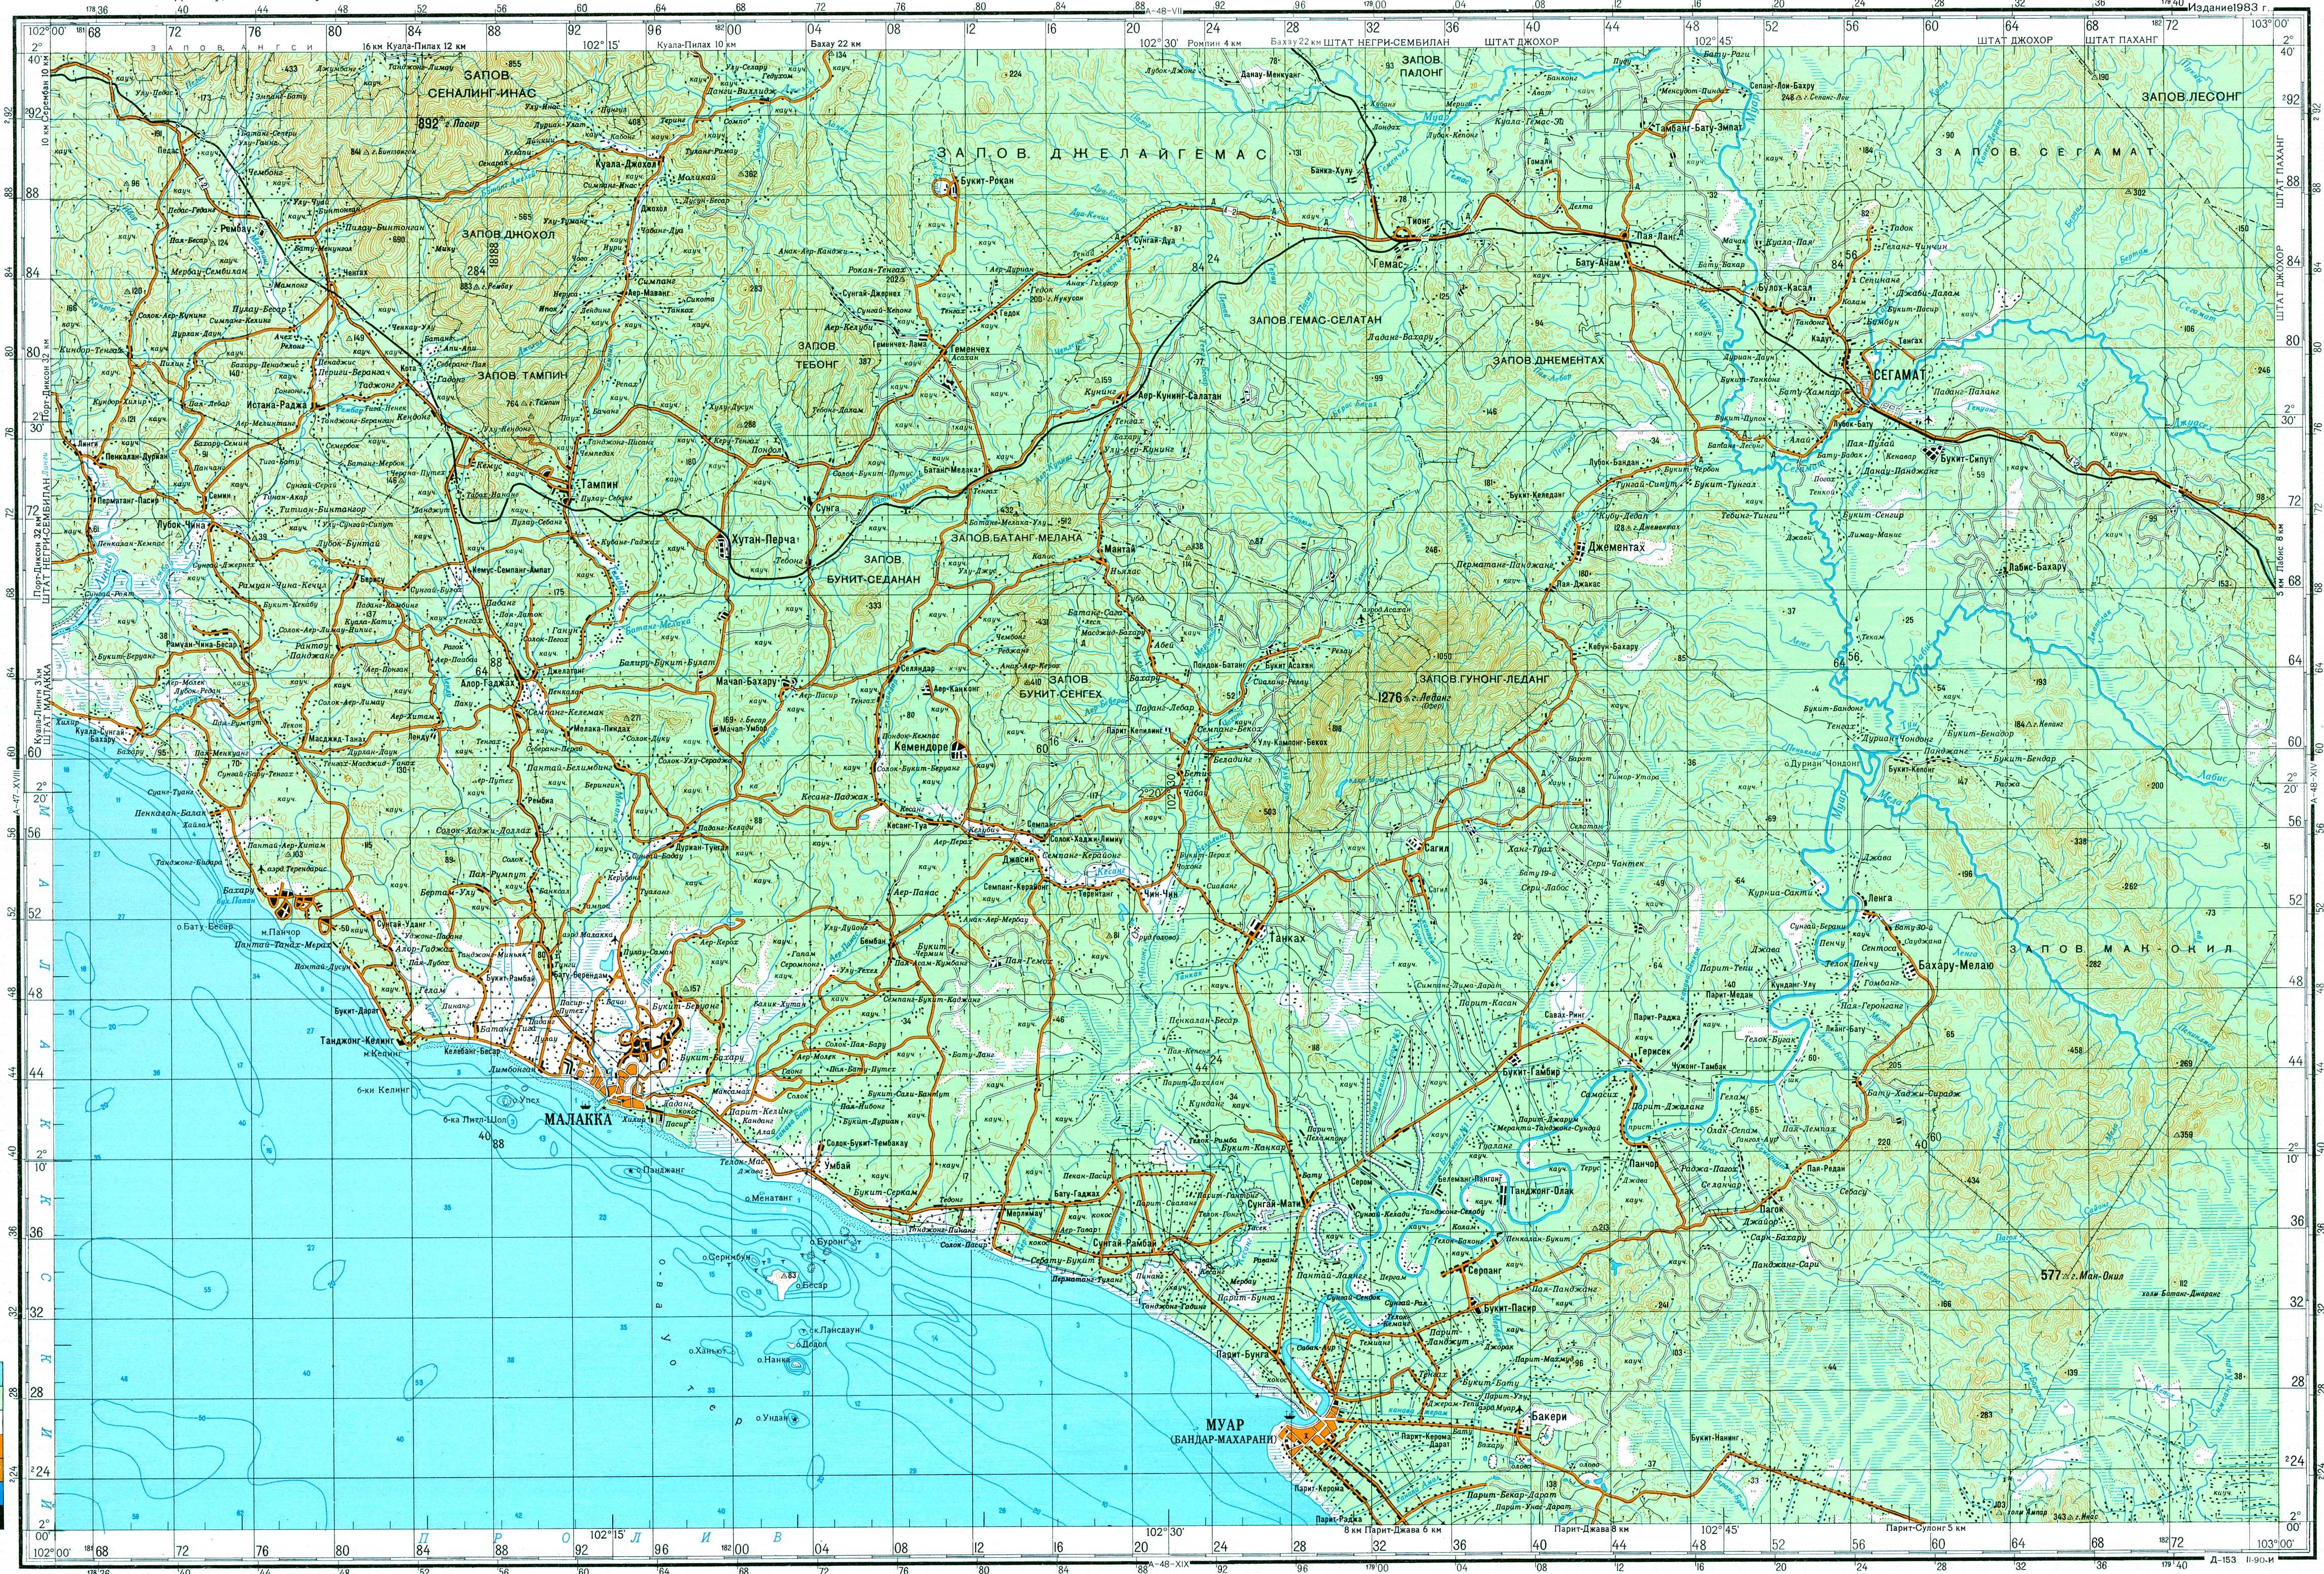 Топографические карты Military Topographic Map - Sweden terrain map